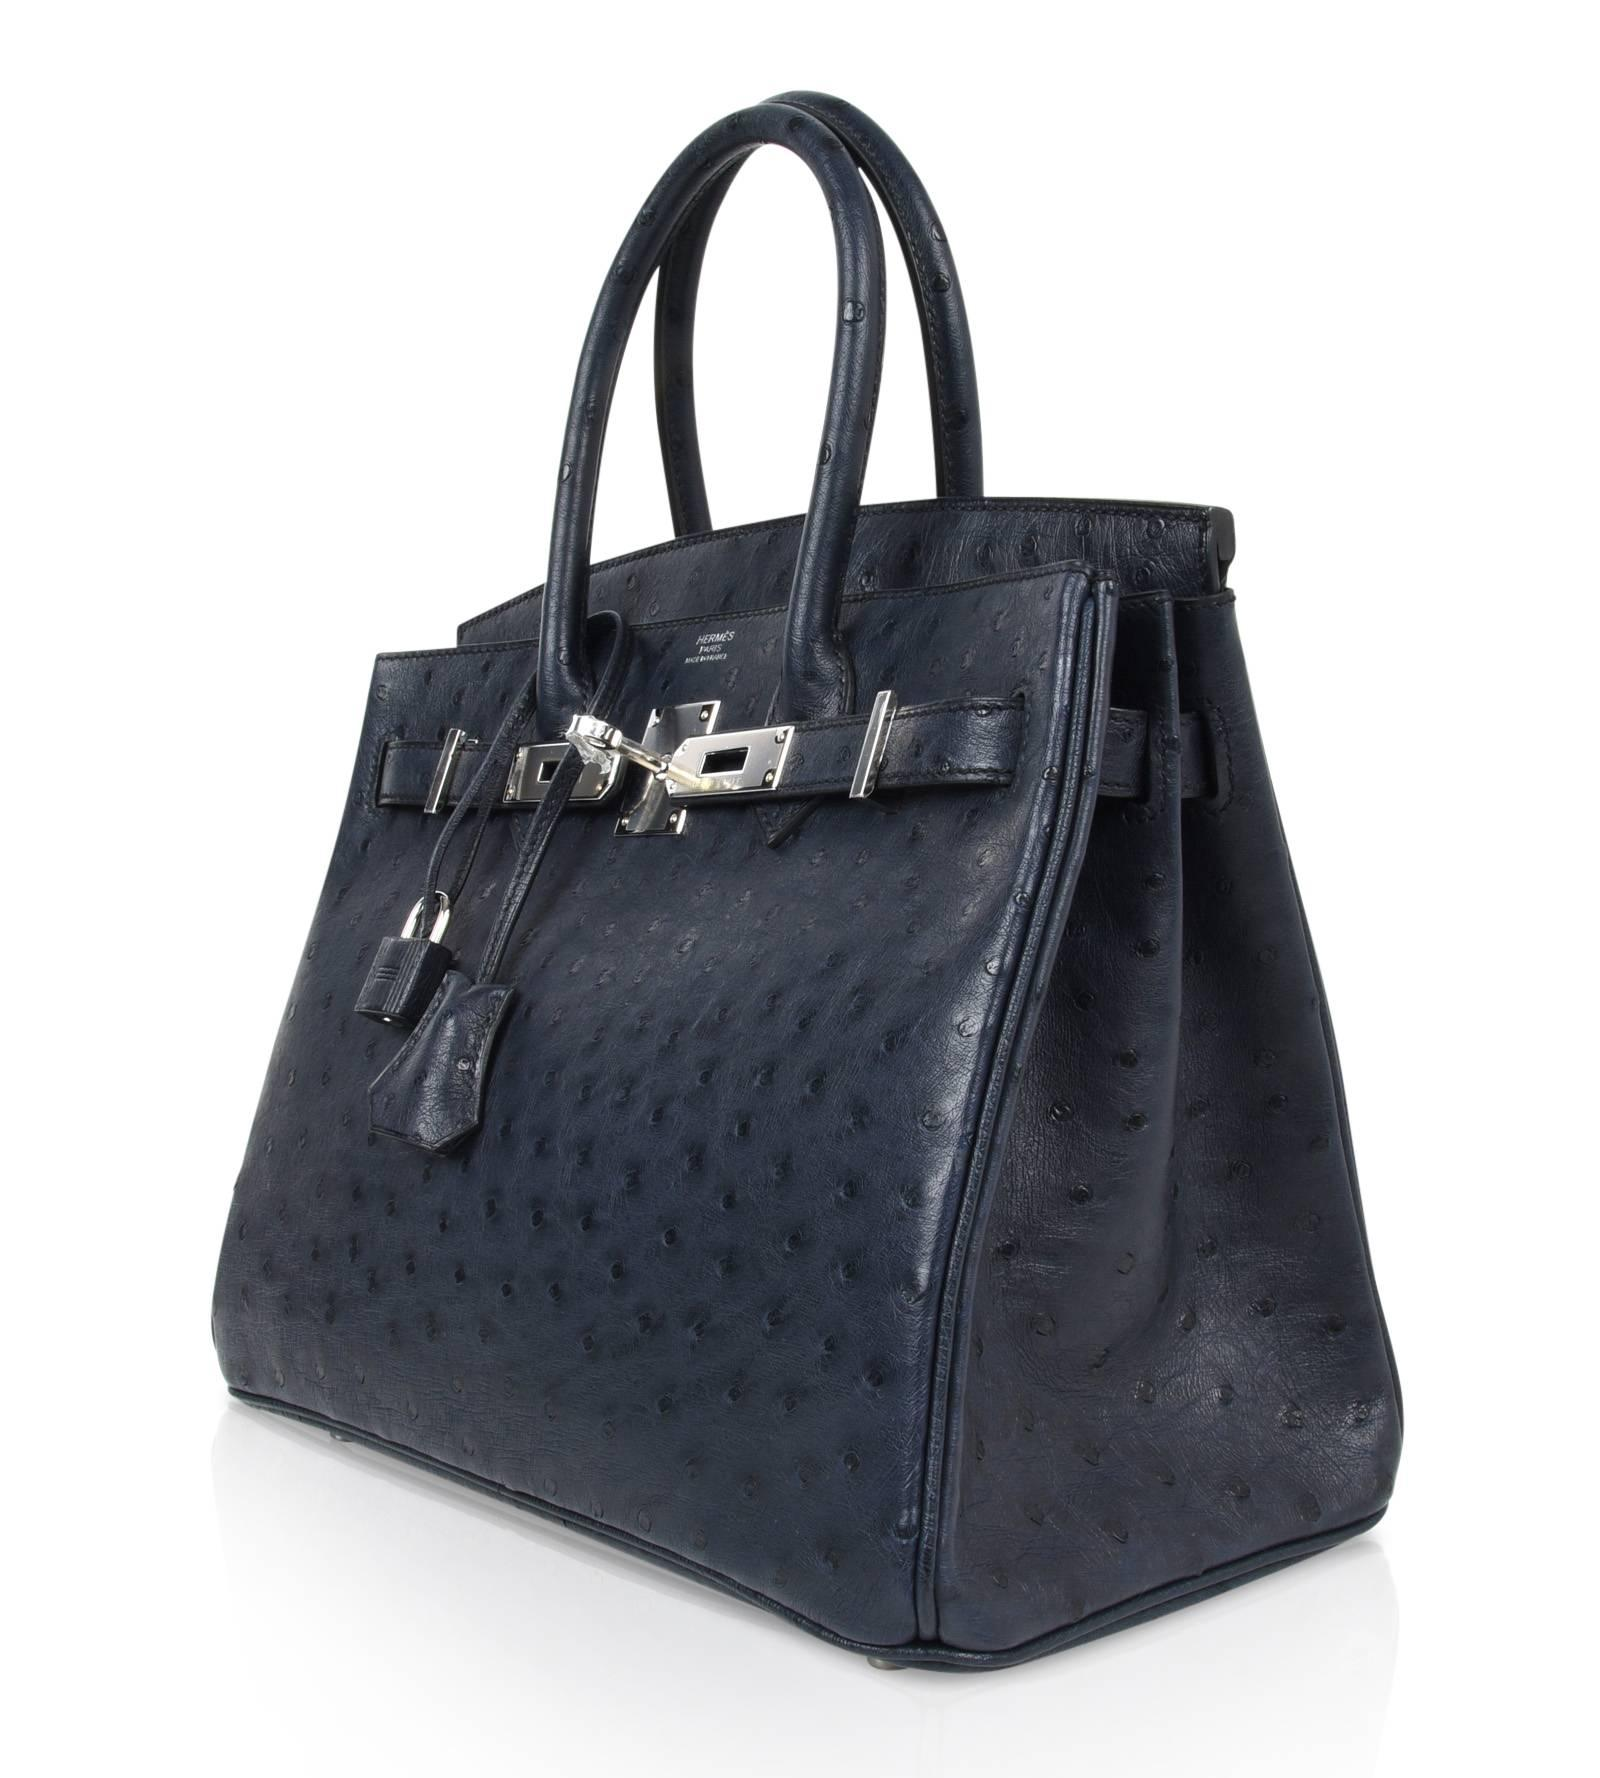 37e7f4b07694 ... cheapest hermes birkin 30 bag beautiful ostrich blue indigo palladium  hardware for sale at 1stdibs 88fad